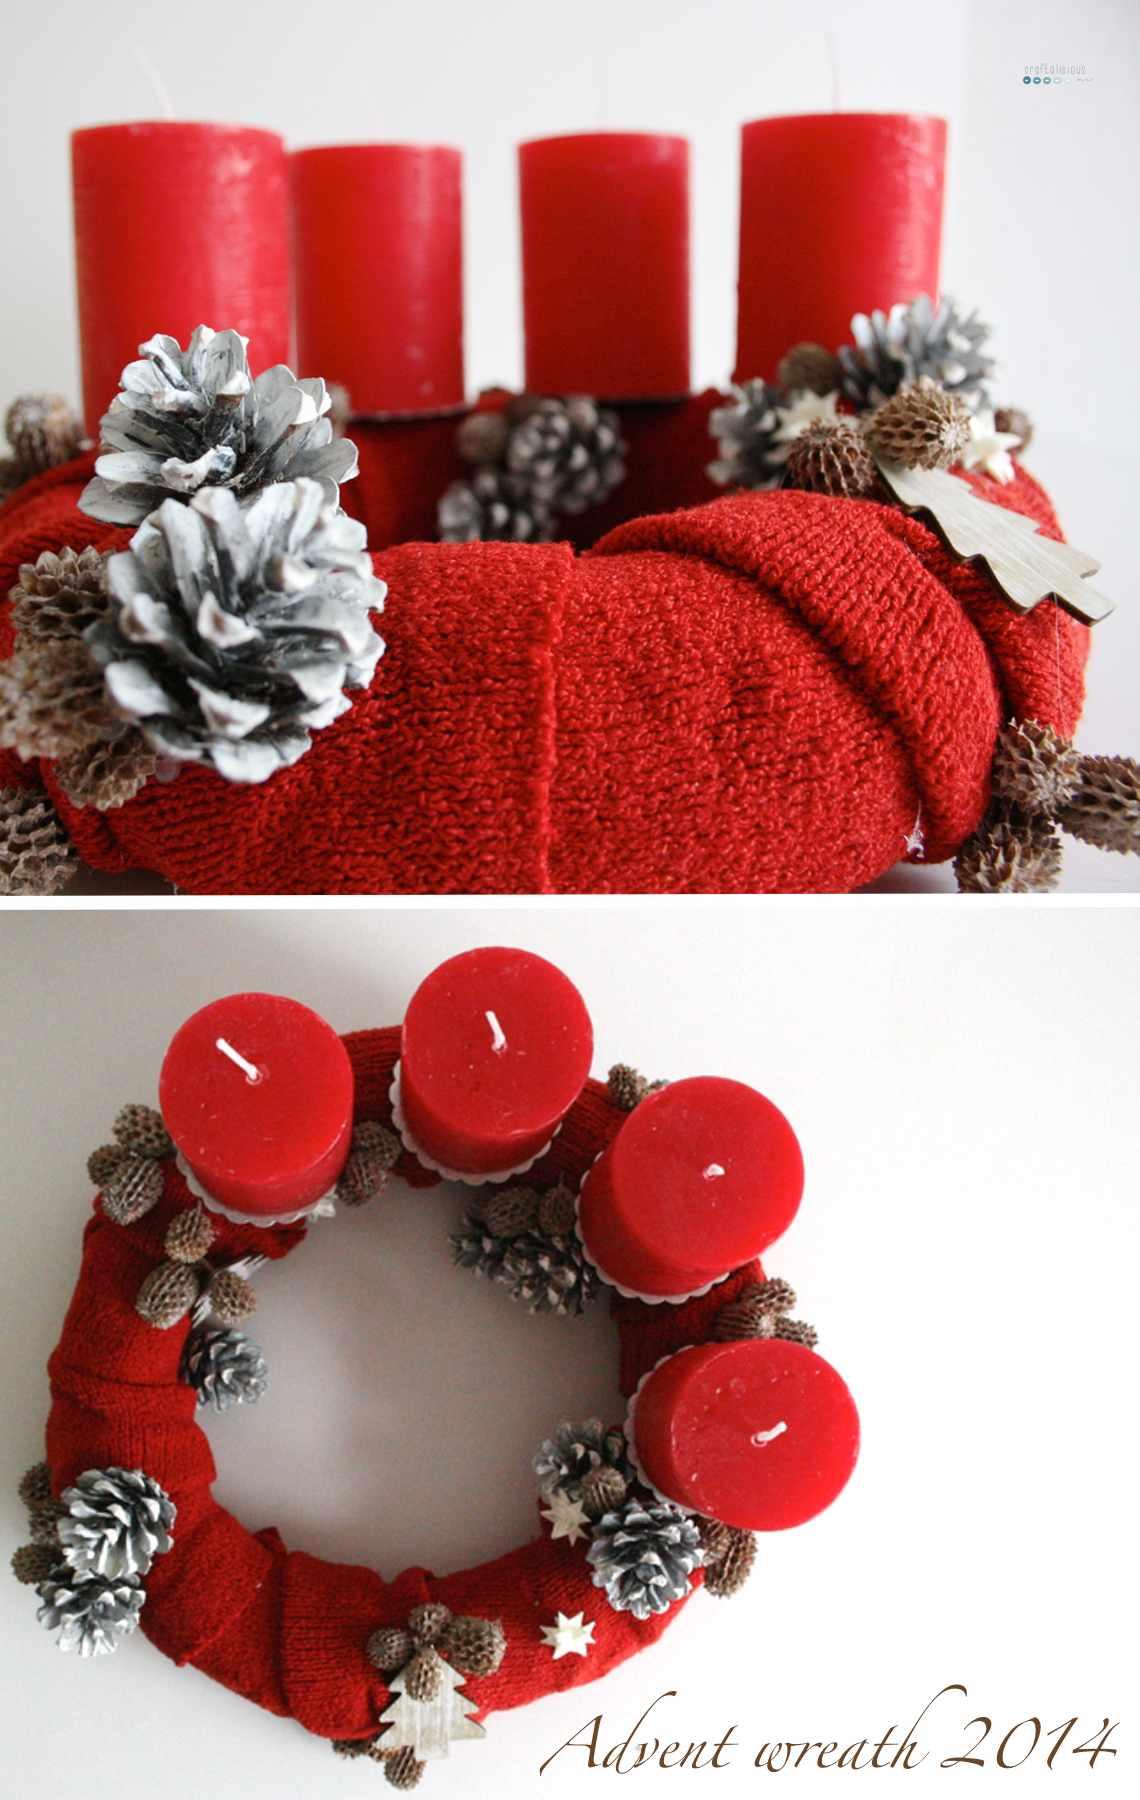 advent wreath 2014